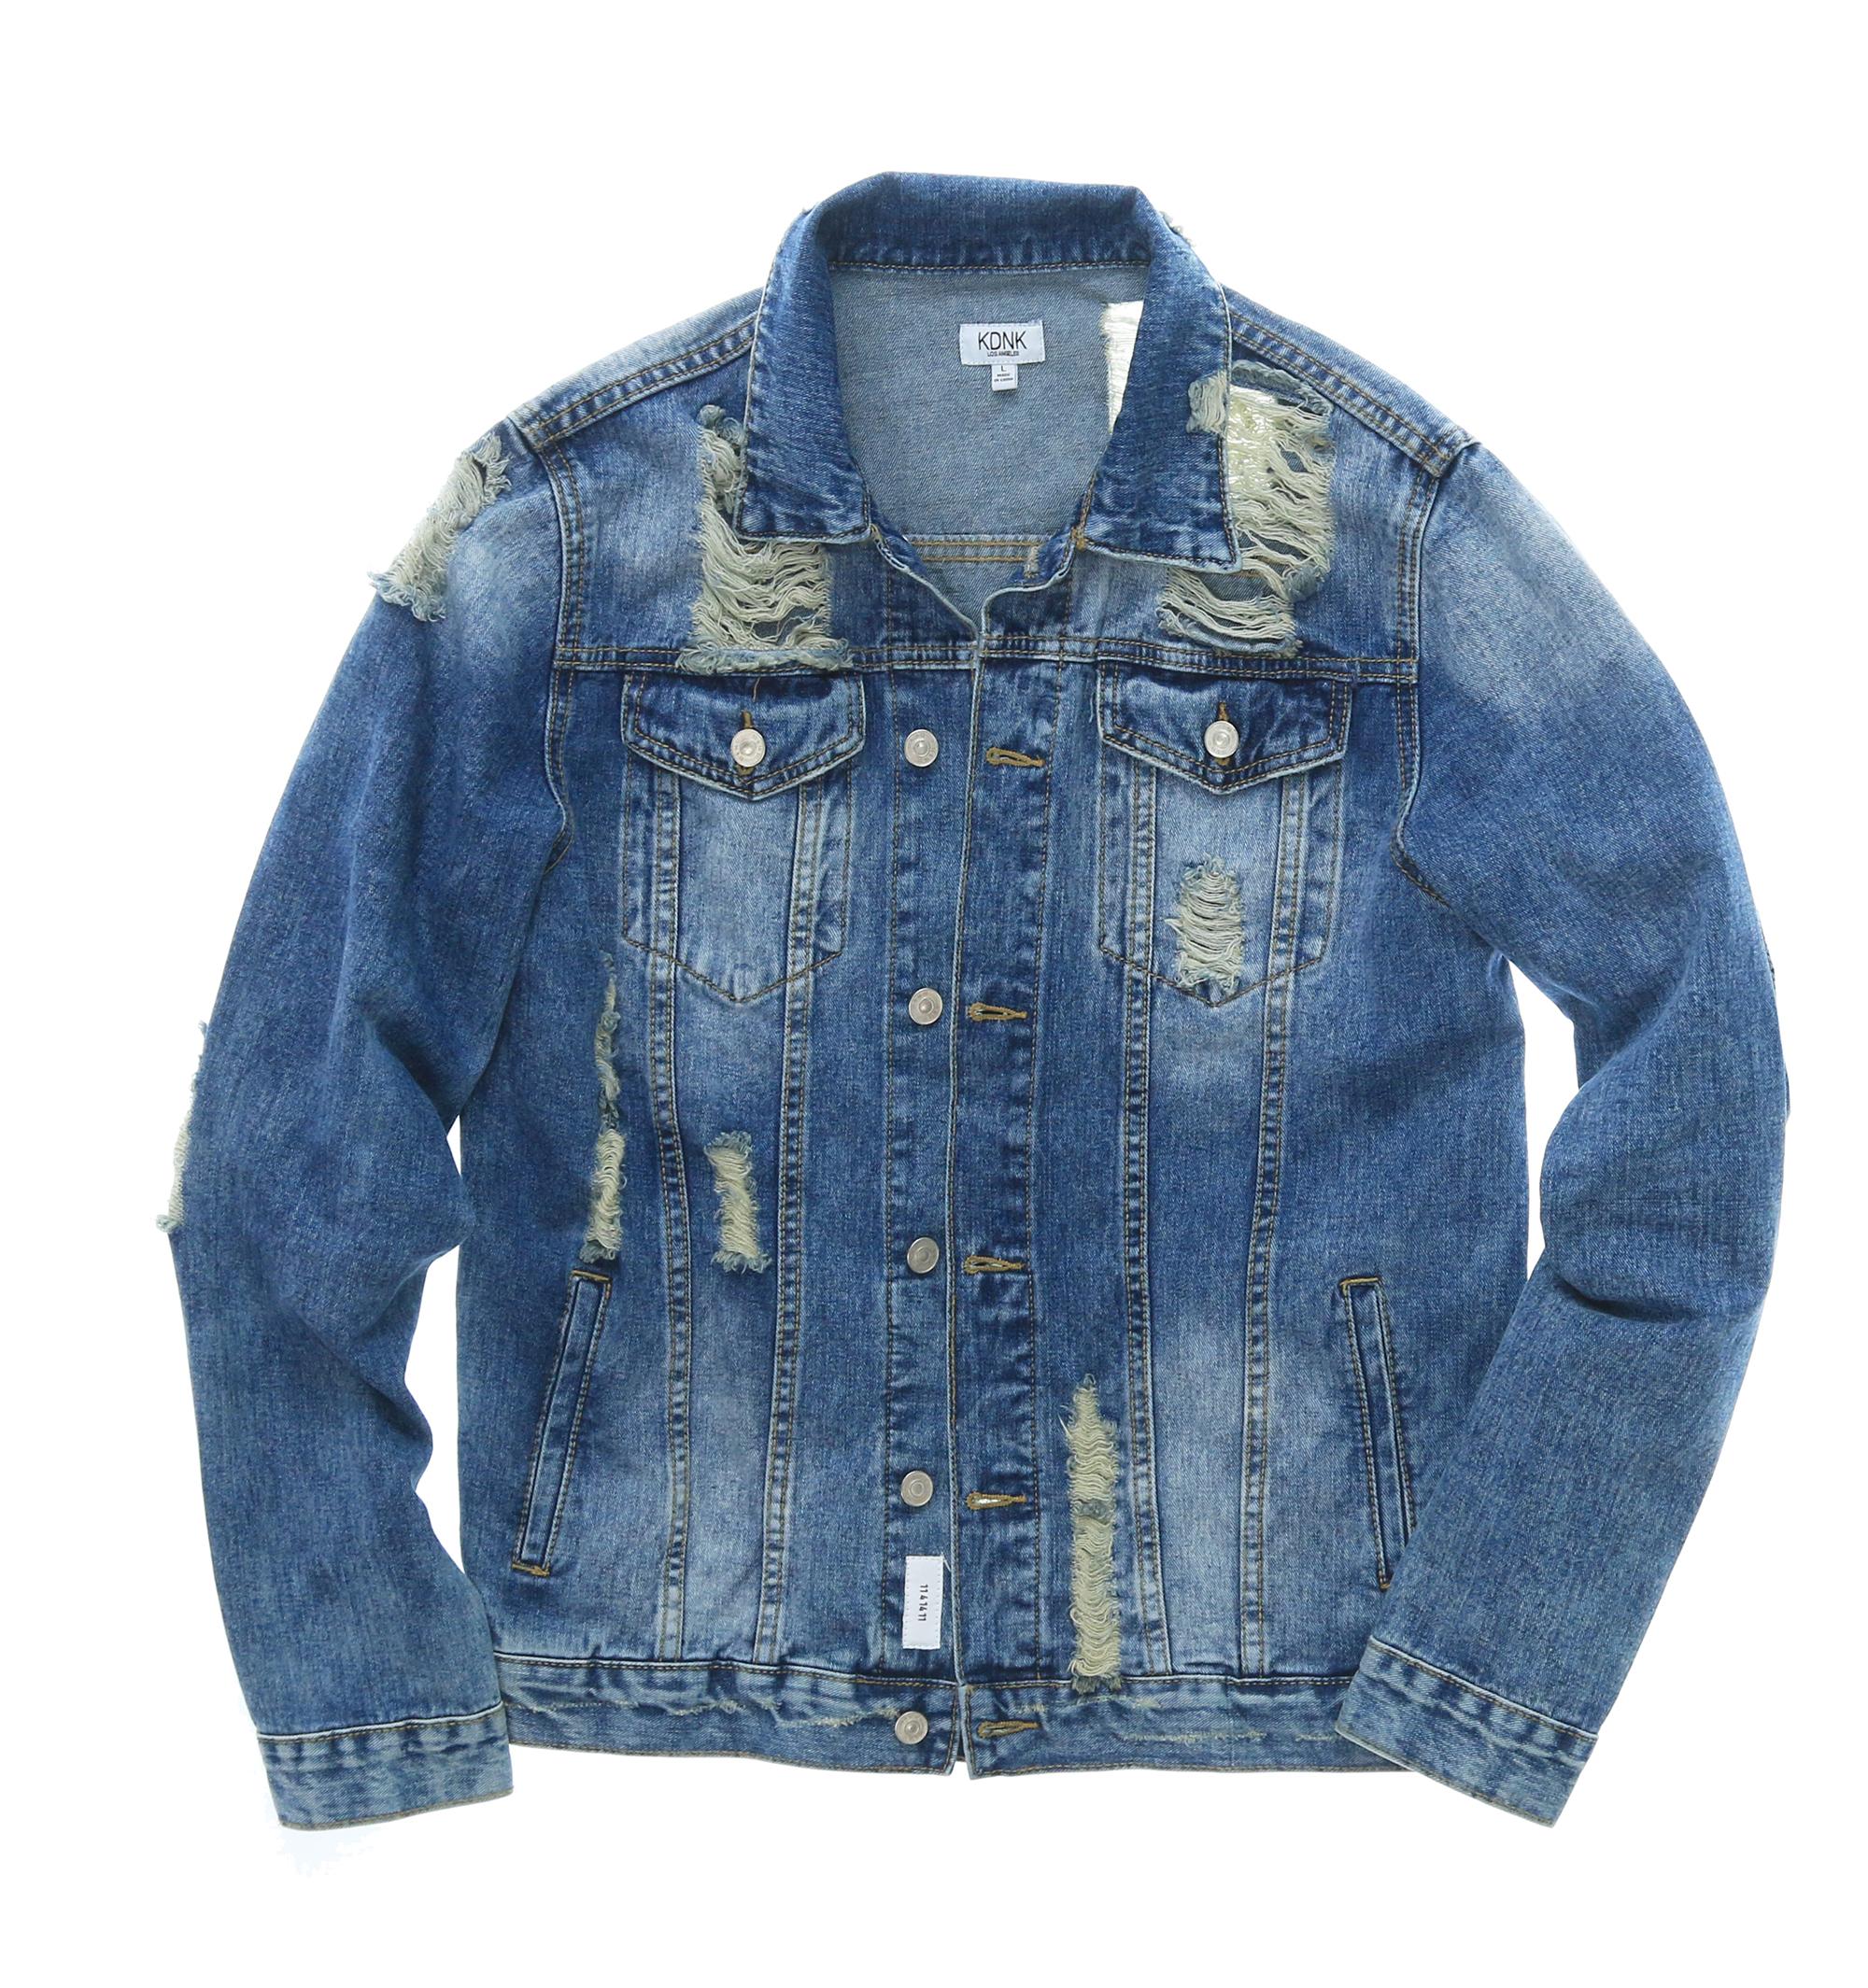 29a4334f5fcd KDNK Men s Distressed Denim Jacket